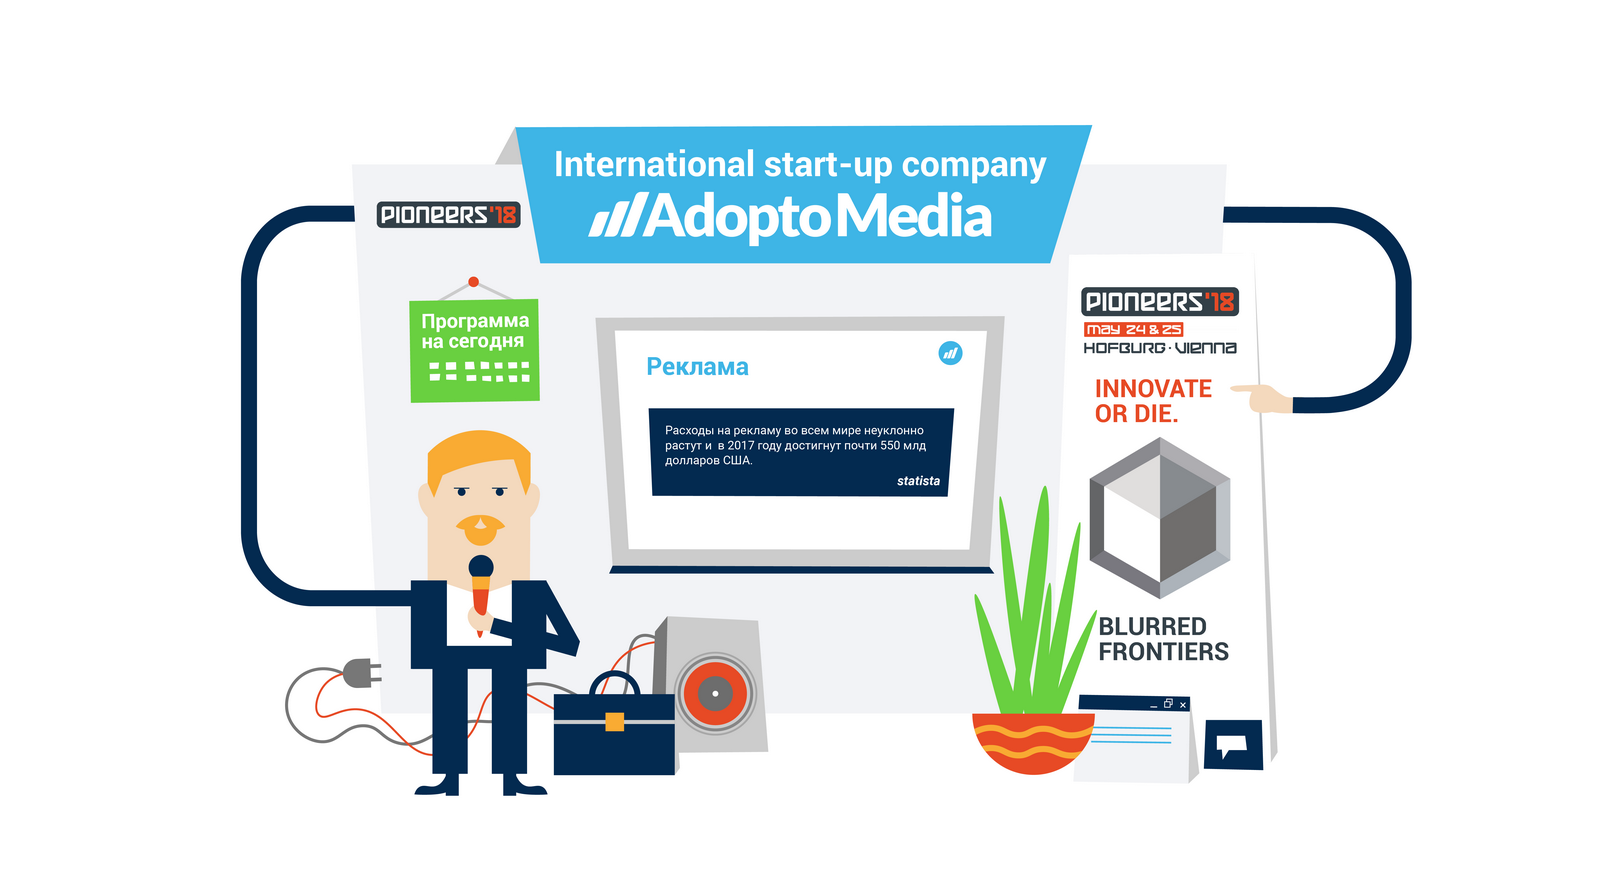 Pioneers Conference 2018,large-scale conference CheckMedia Solution, AdoptoMedia, реклама, маркетинг, оптимизация рекламного бюджета,